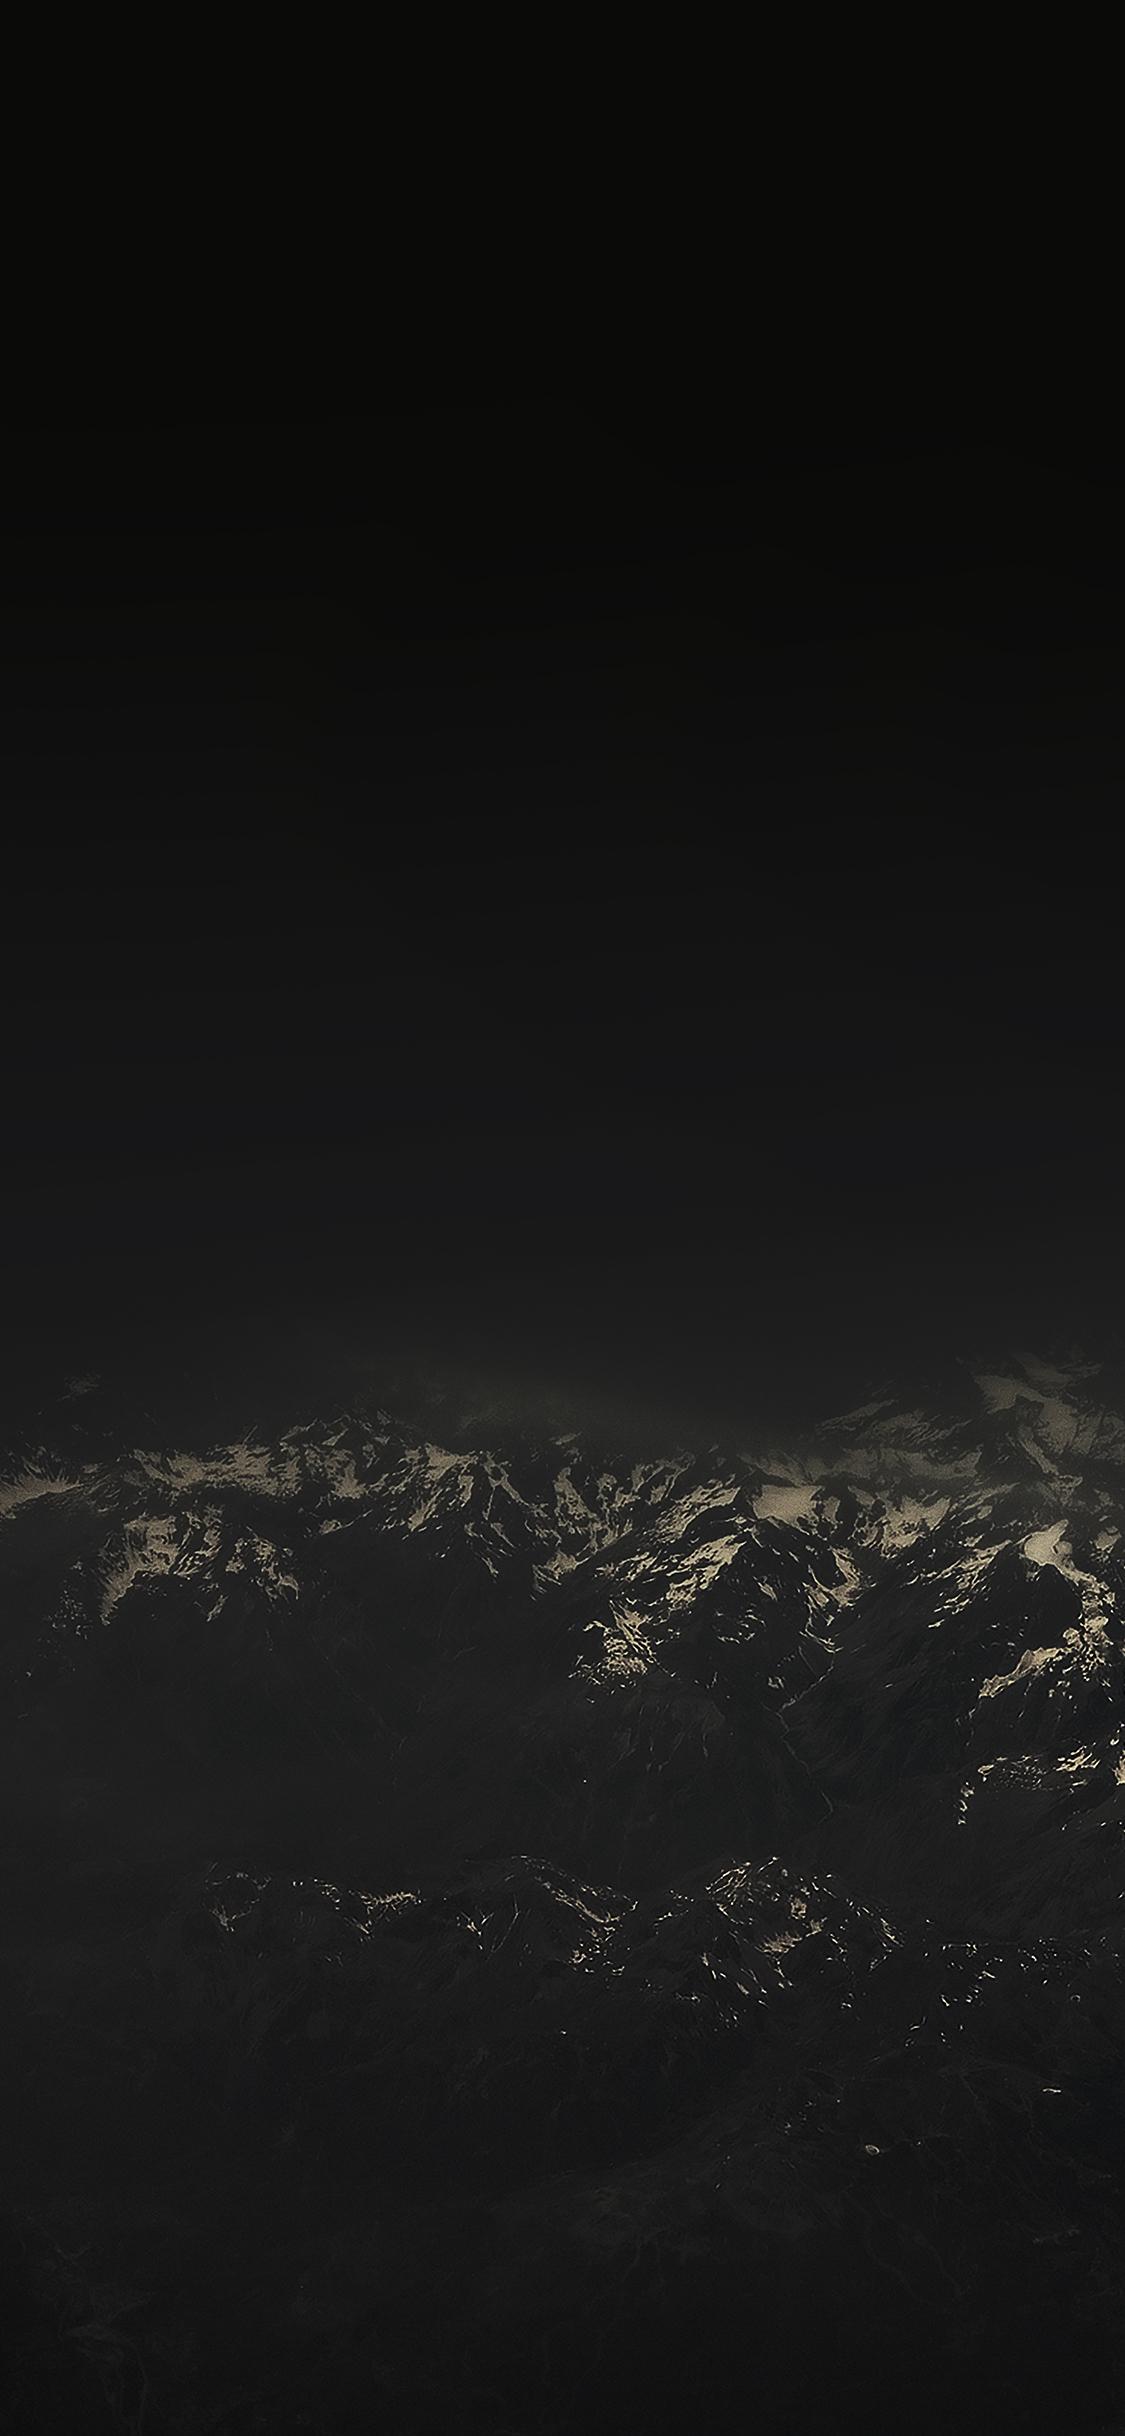 Me49 The Alps Dark Mountain Sky View Wallpaper